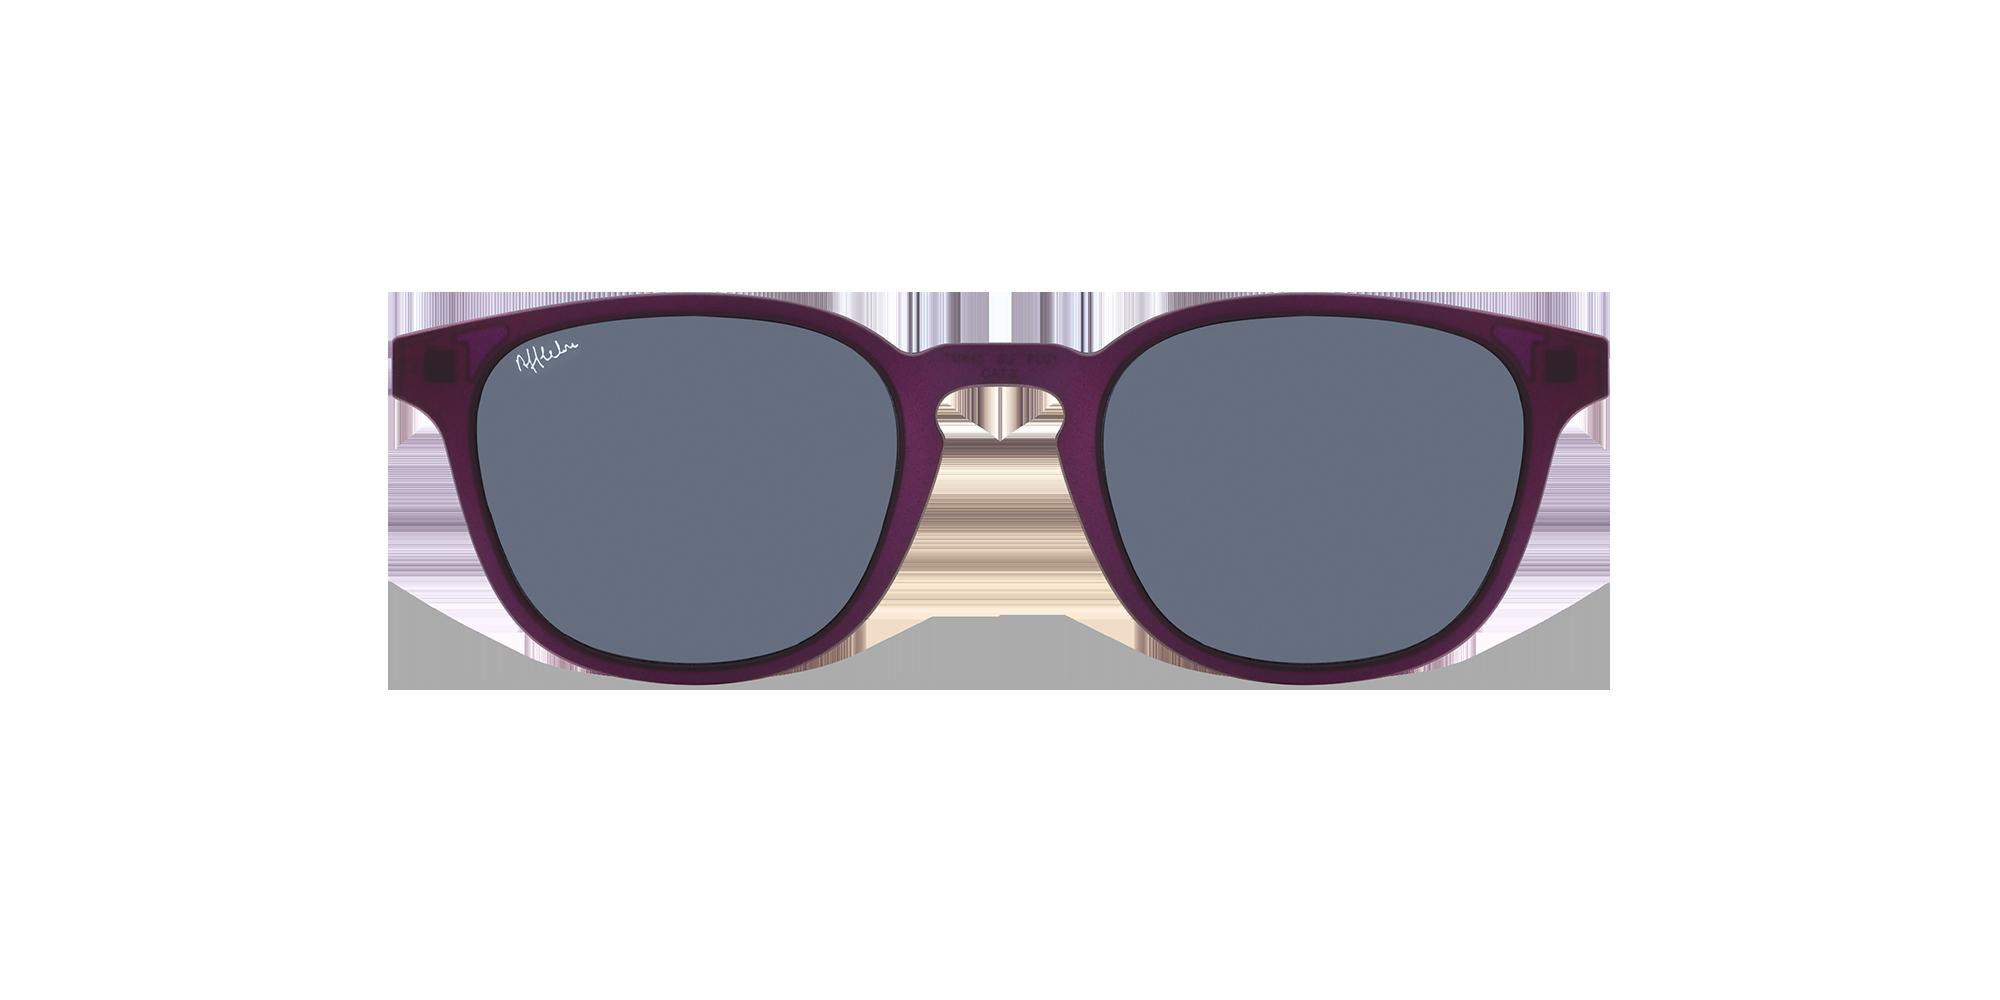 afflelou/france/products/smart_clip/clips_glasses/07630036429136_face.png